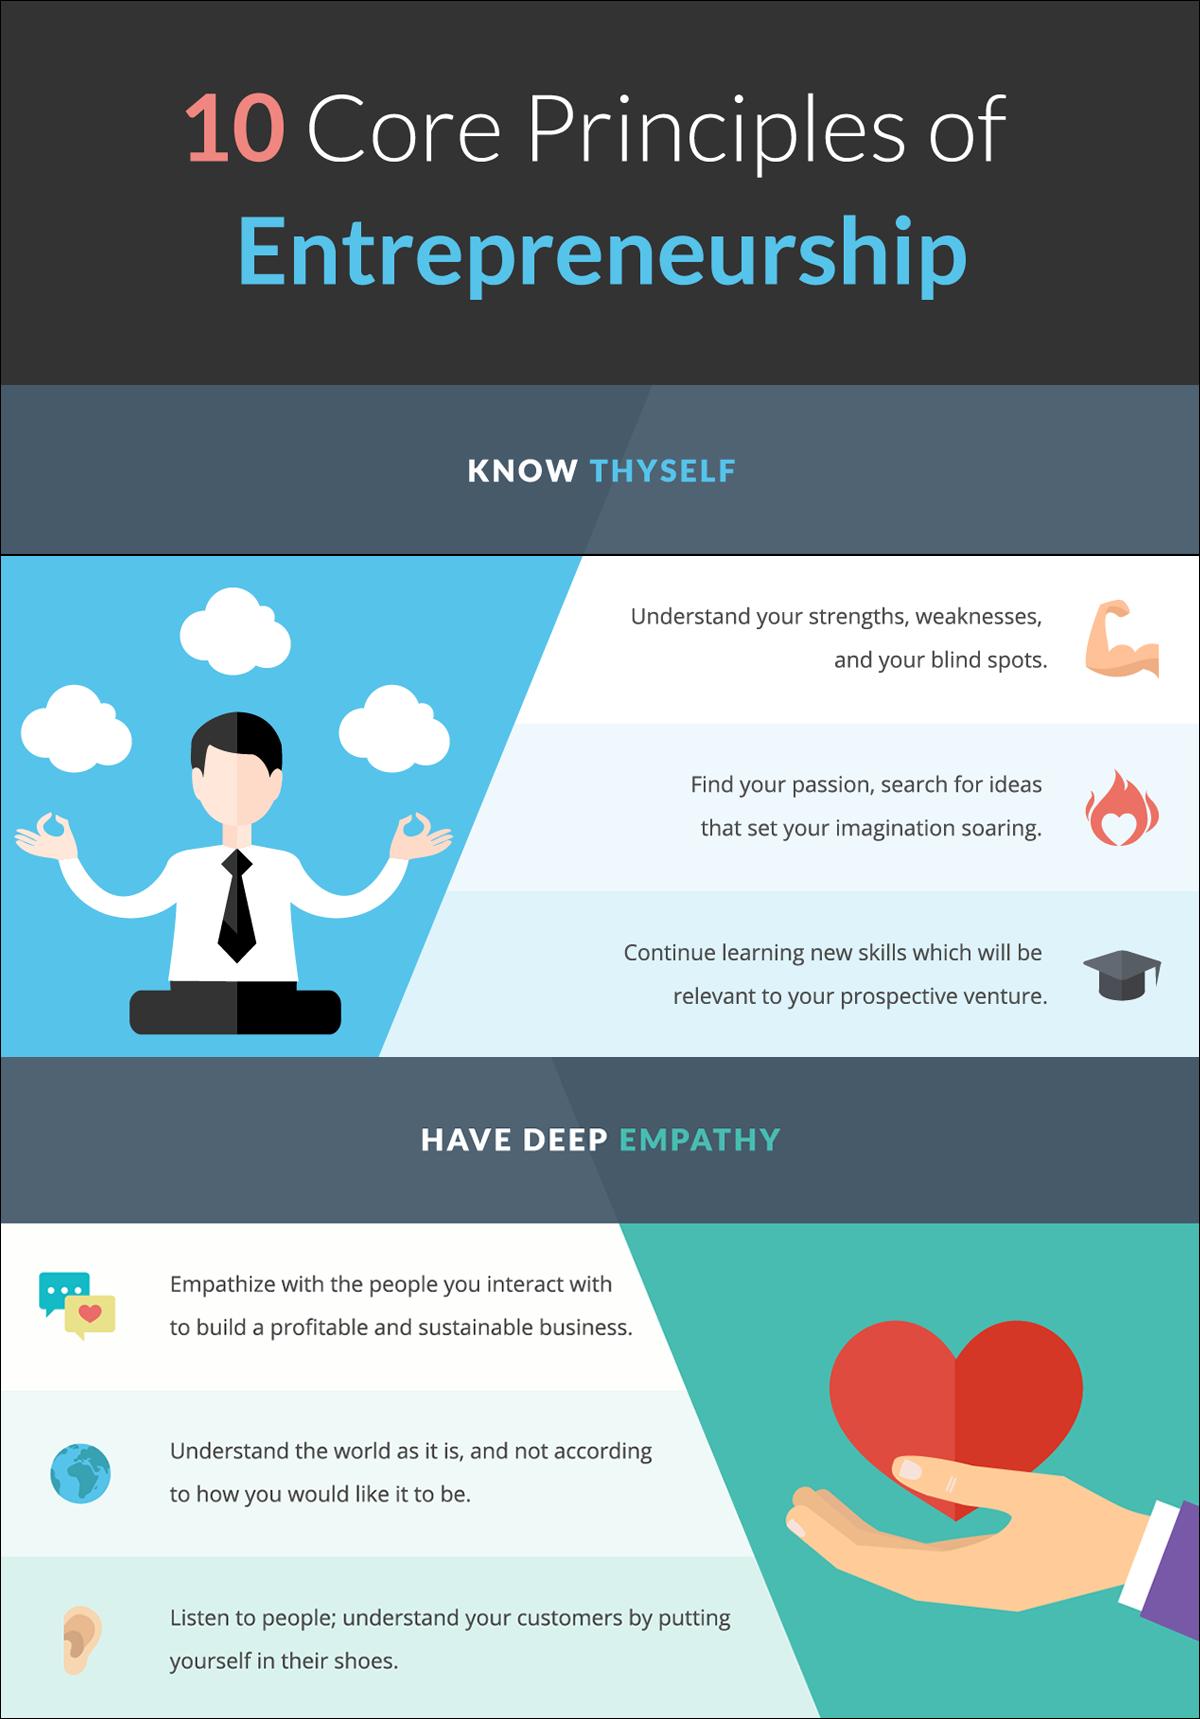 10-core-principles-of-entrepreneurship best infographics best infographic examples